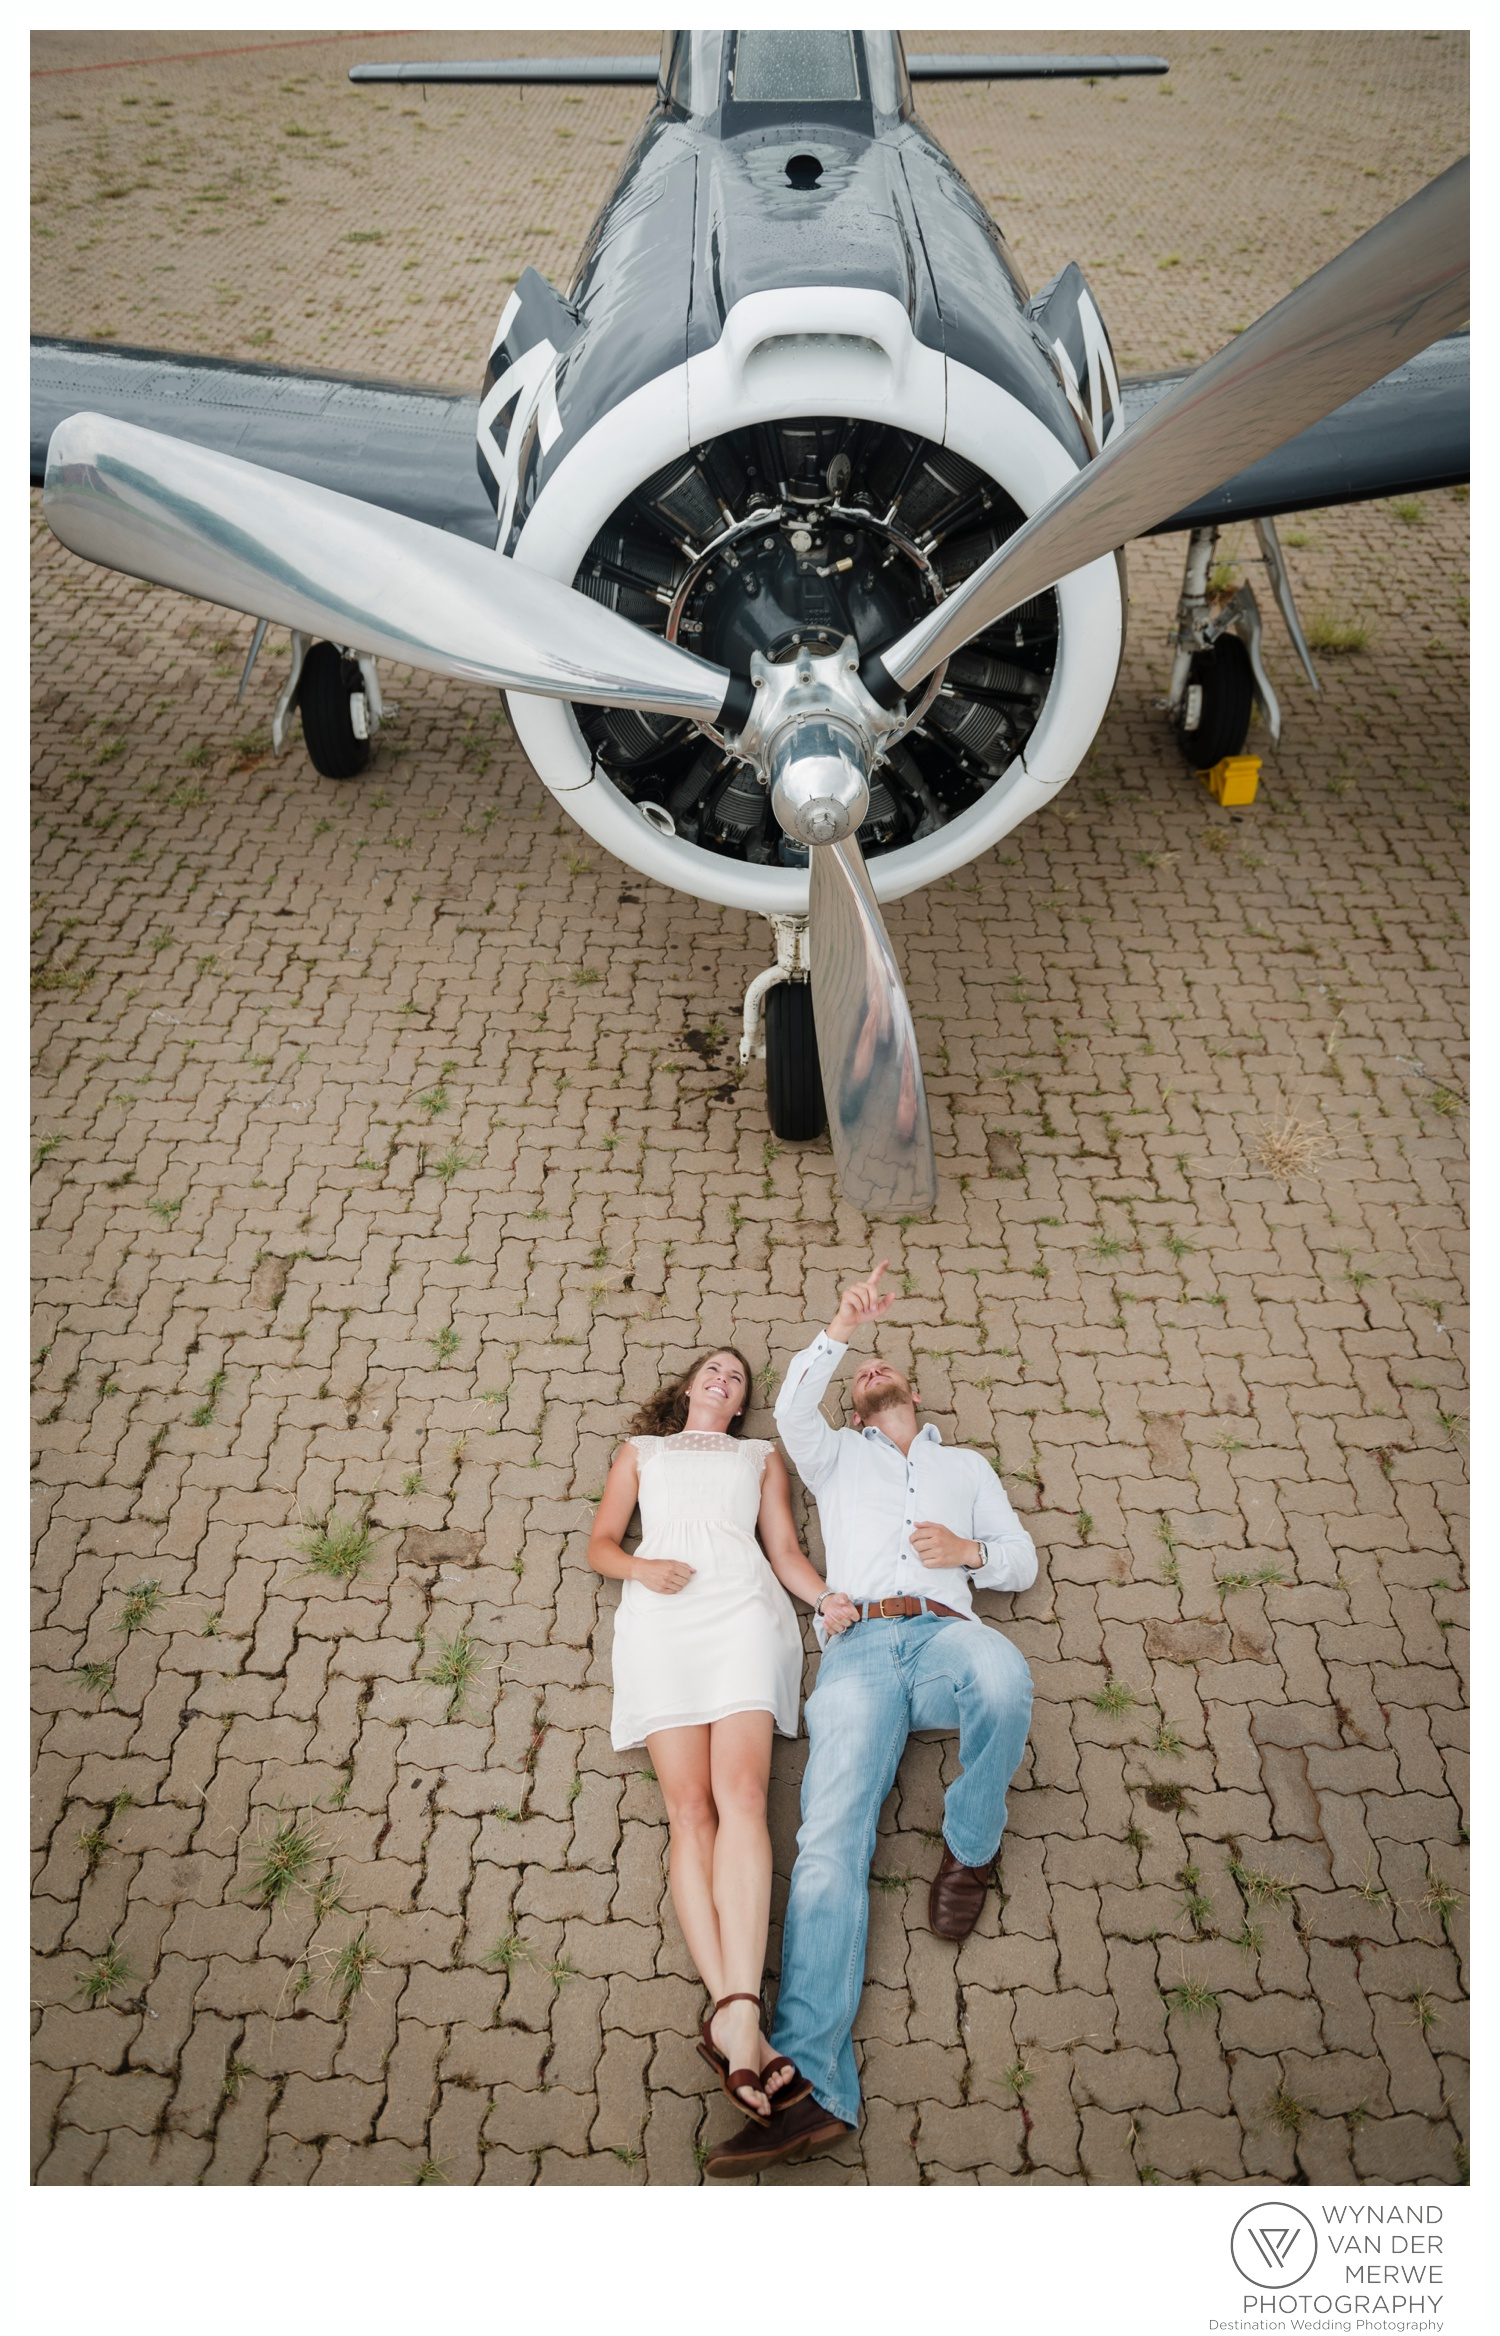 WynandvanderMerwe_weddingphotography_engagementshoot_wonderboomairport_aeroplane_klaasjanmareli_gauteng_2018-6.jpg